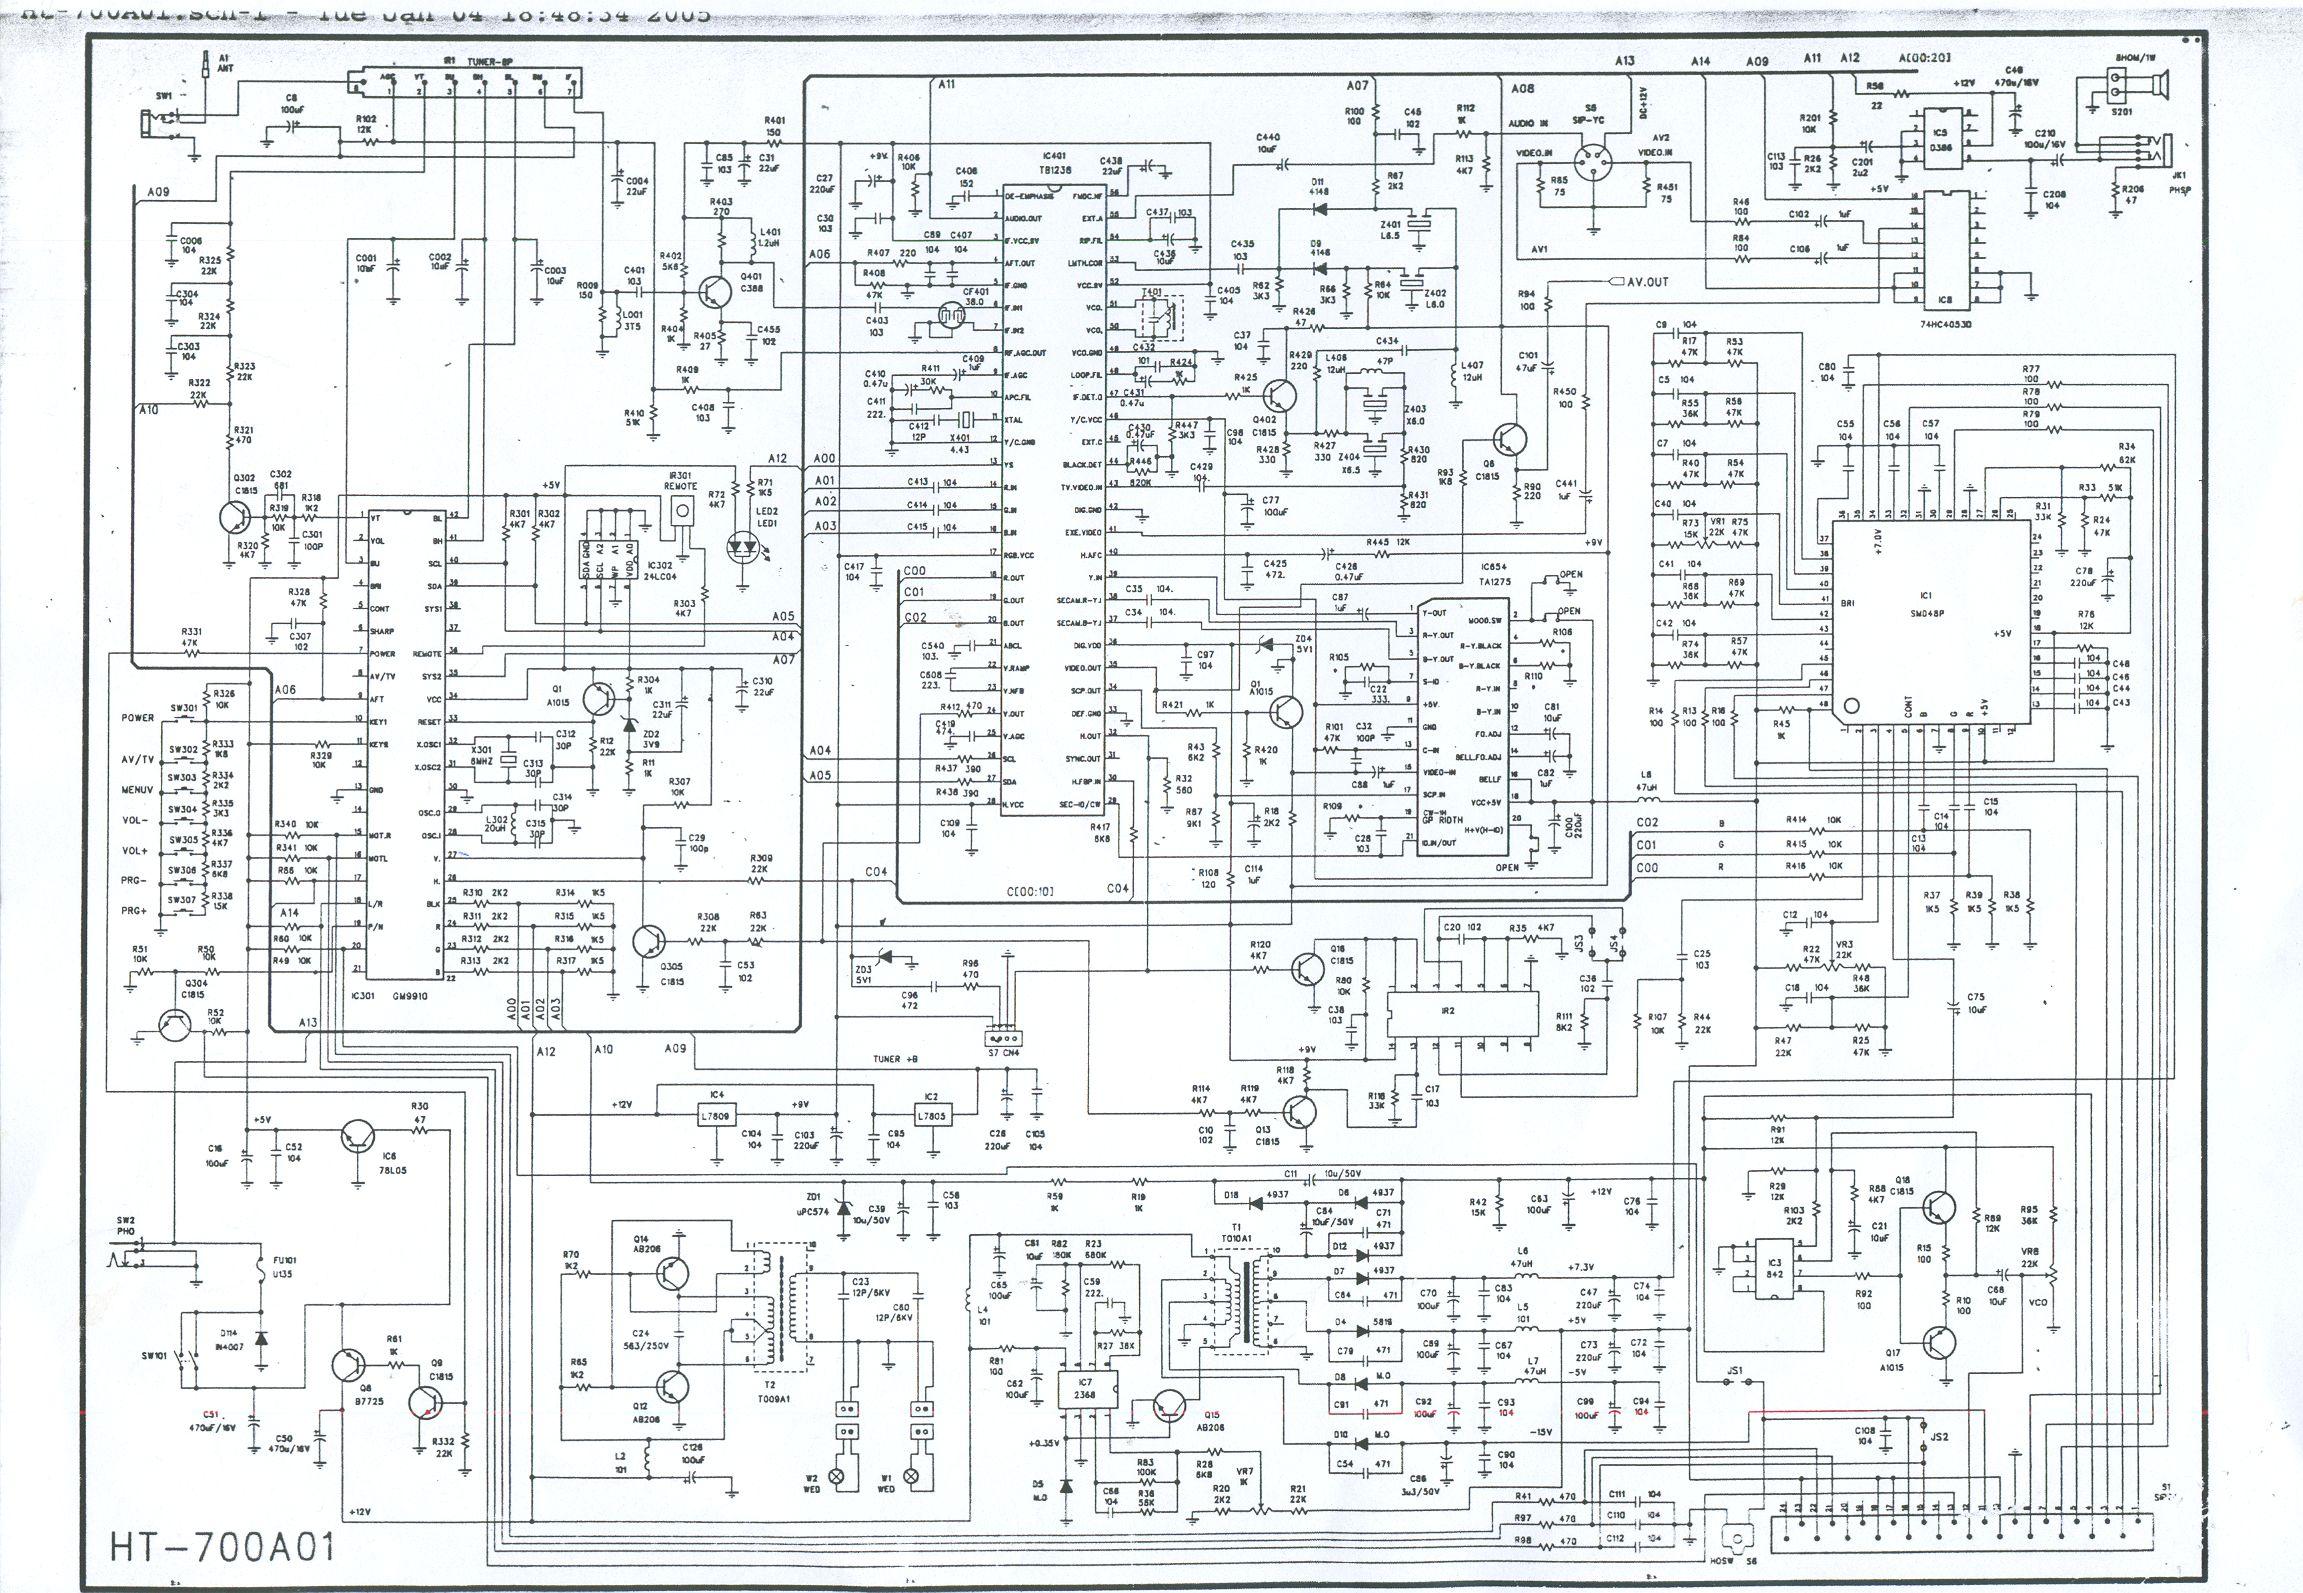 coson btv 100 схема